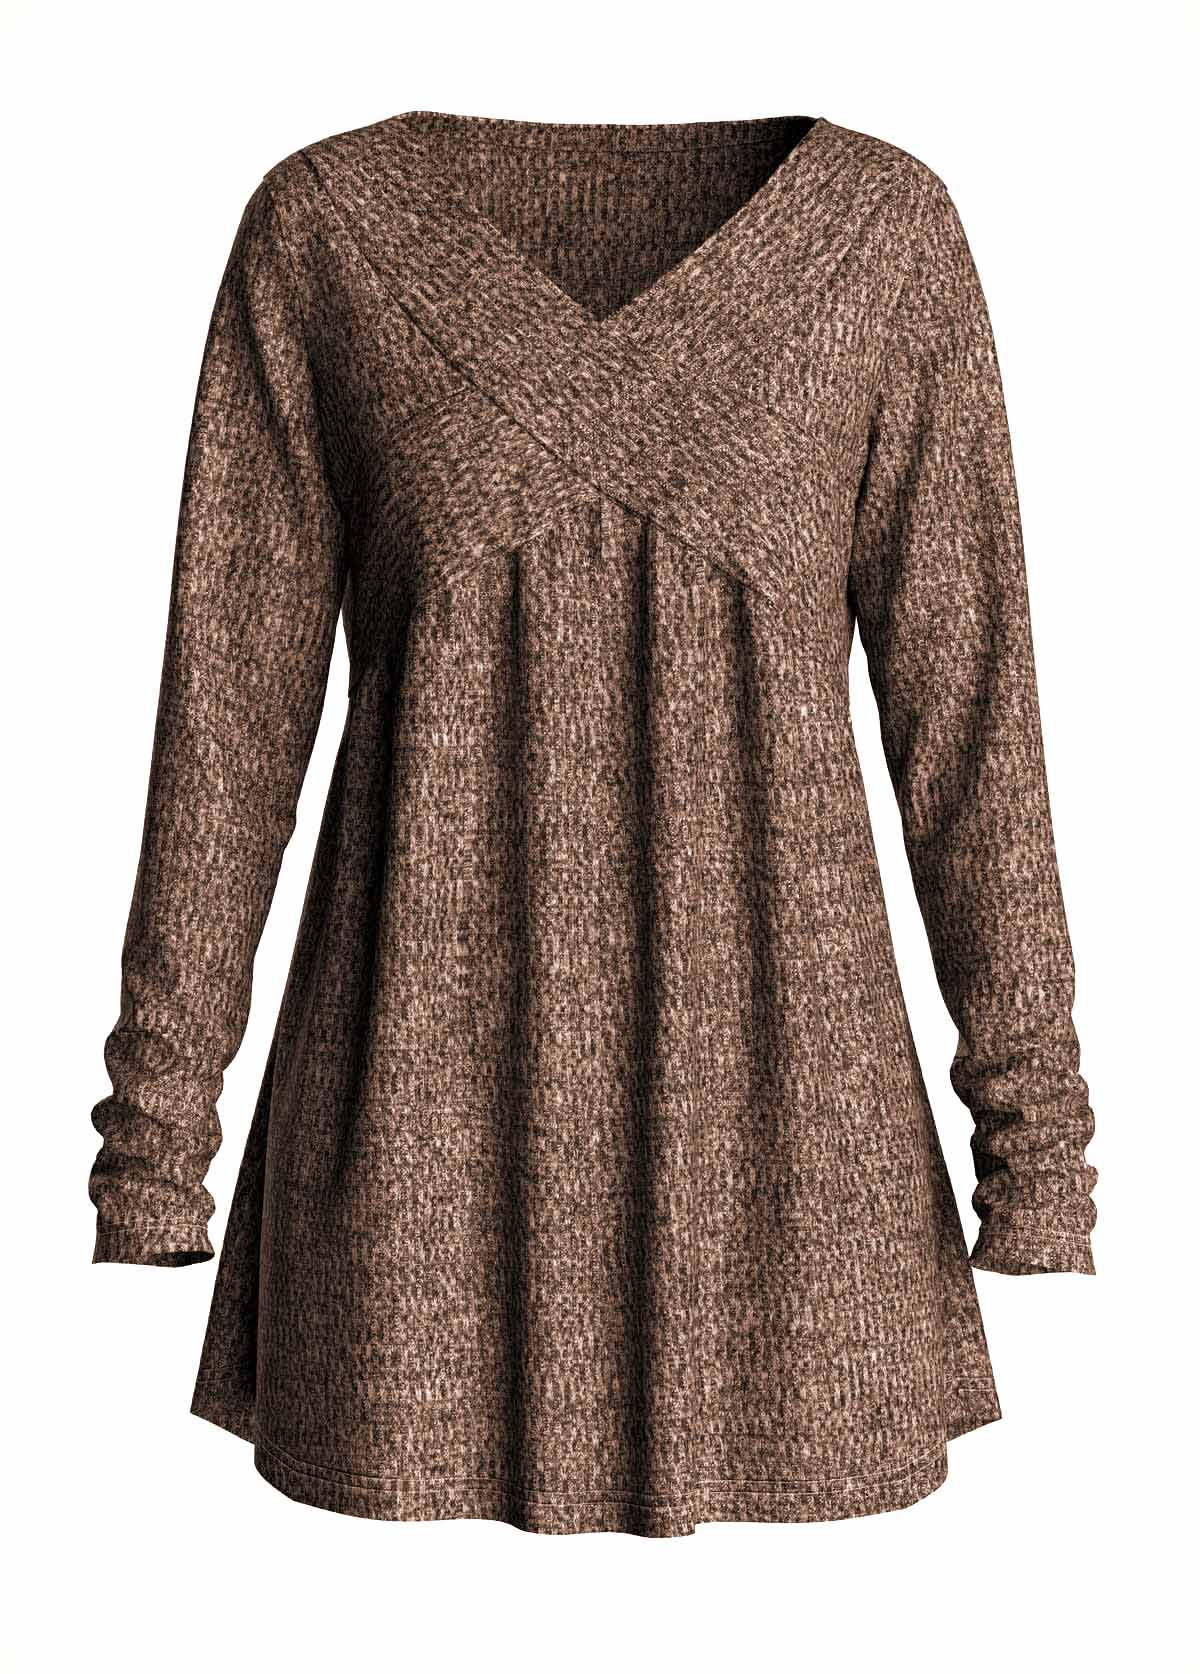 ROTITA Long Sleeve V Neck Solid T Shirt